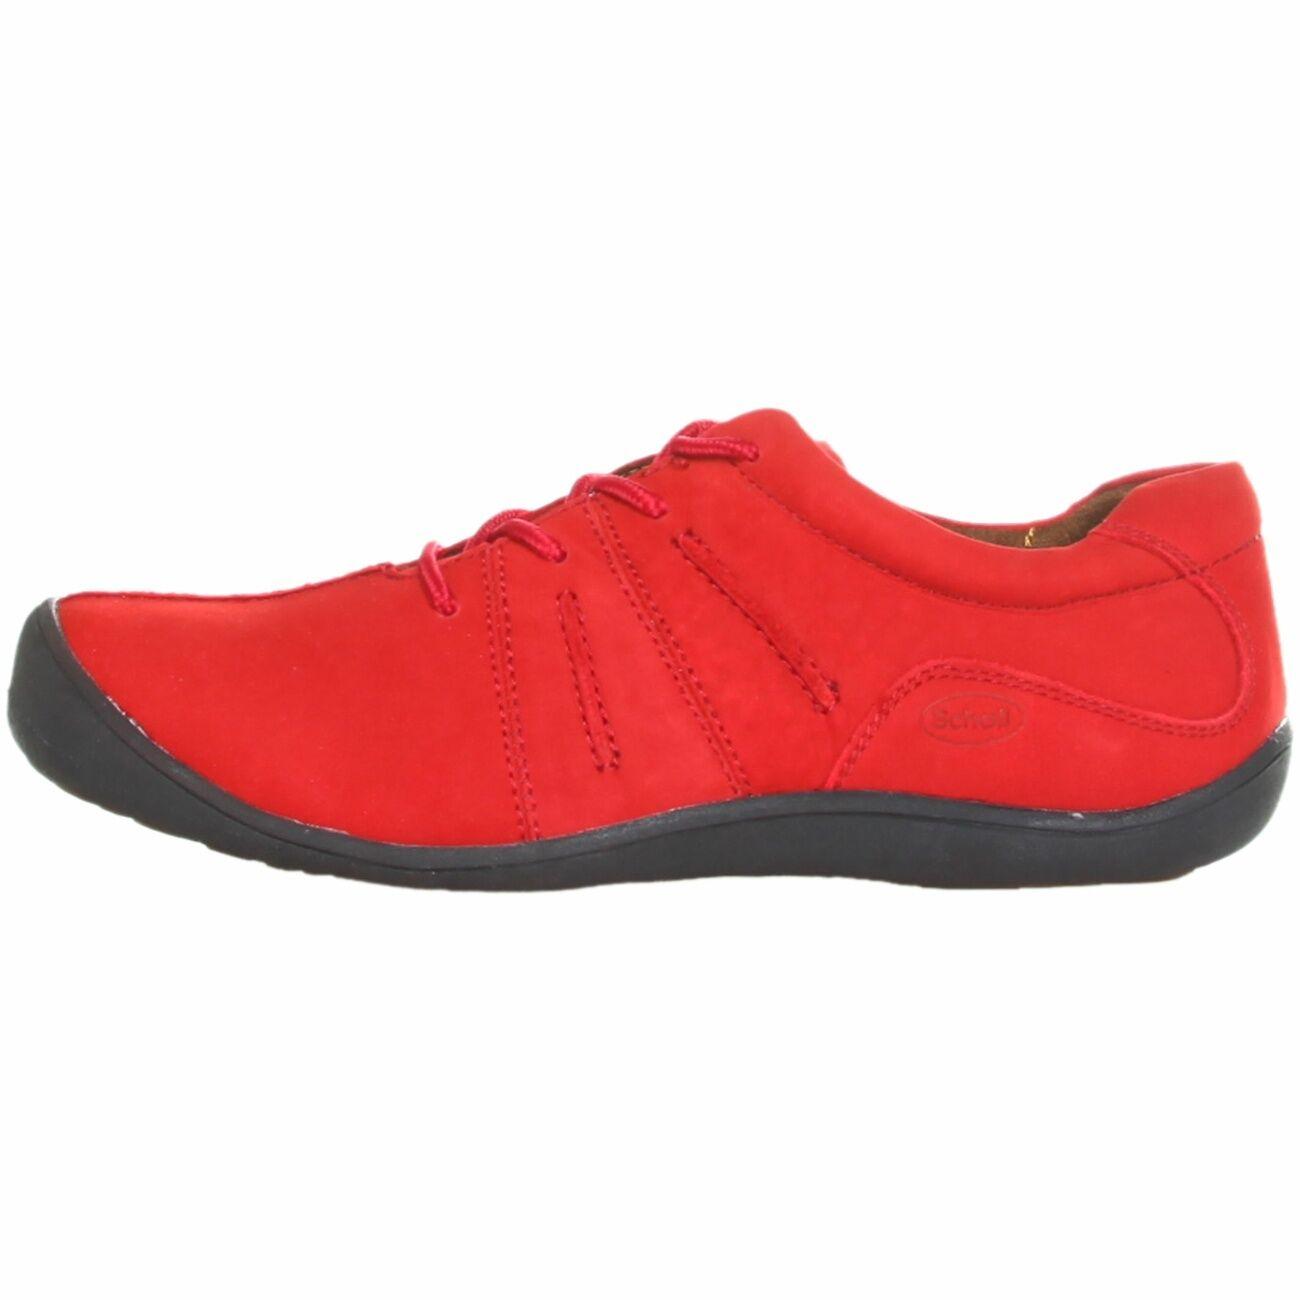 Dr. Scholl MISTRAL F230871014 Sneakers Halbschuhe Schnürer EU 39 UK 6, Cherry